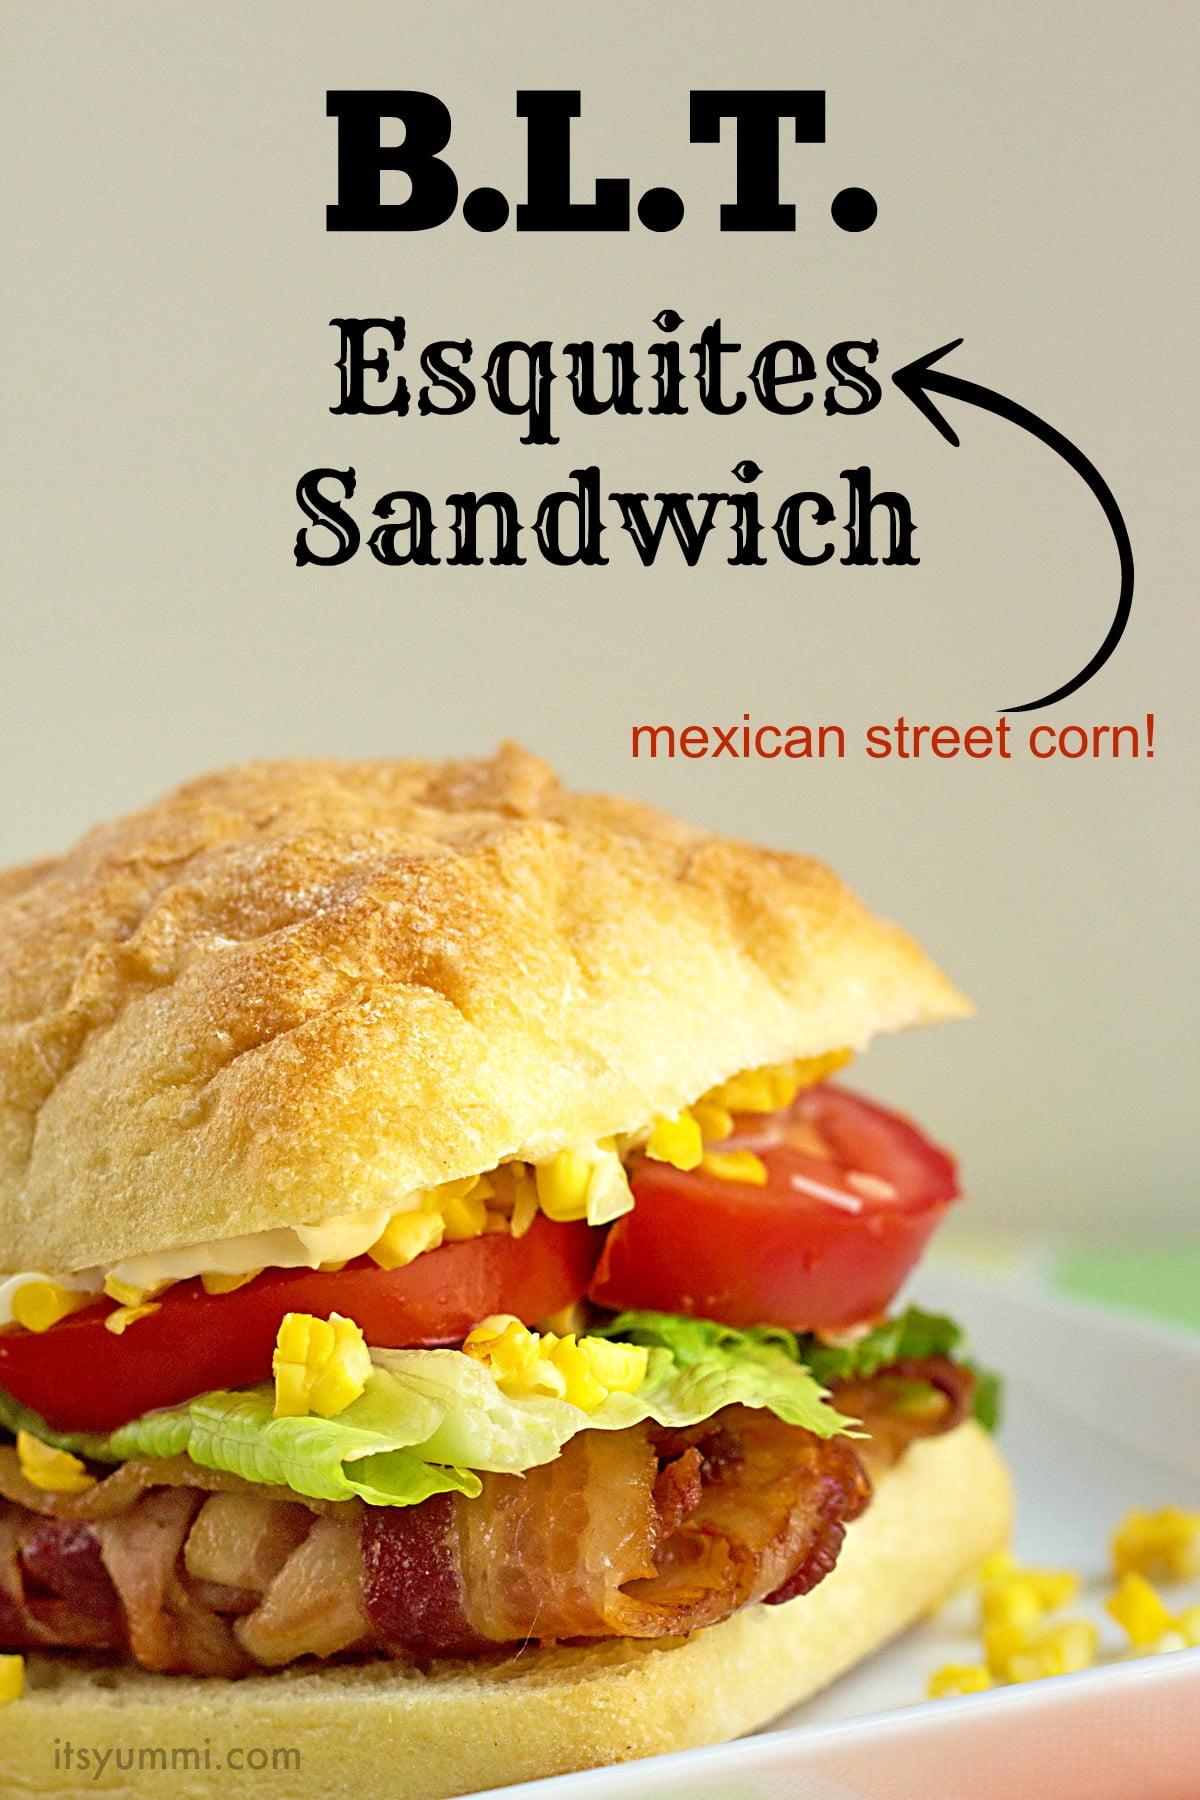 BLT Esquites Sandwich from ItsYummi.com